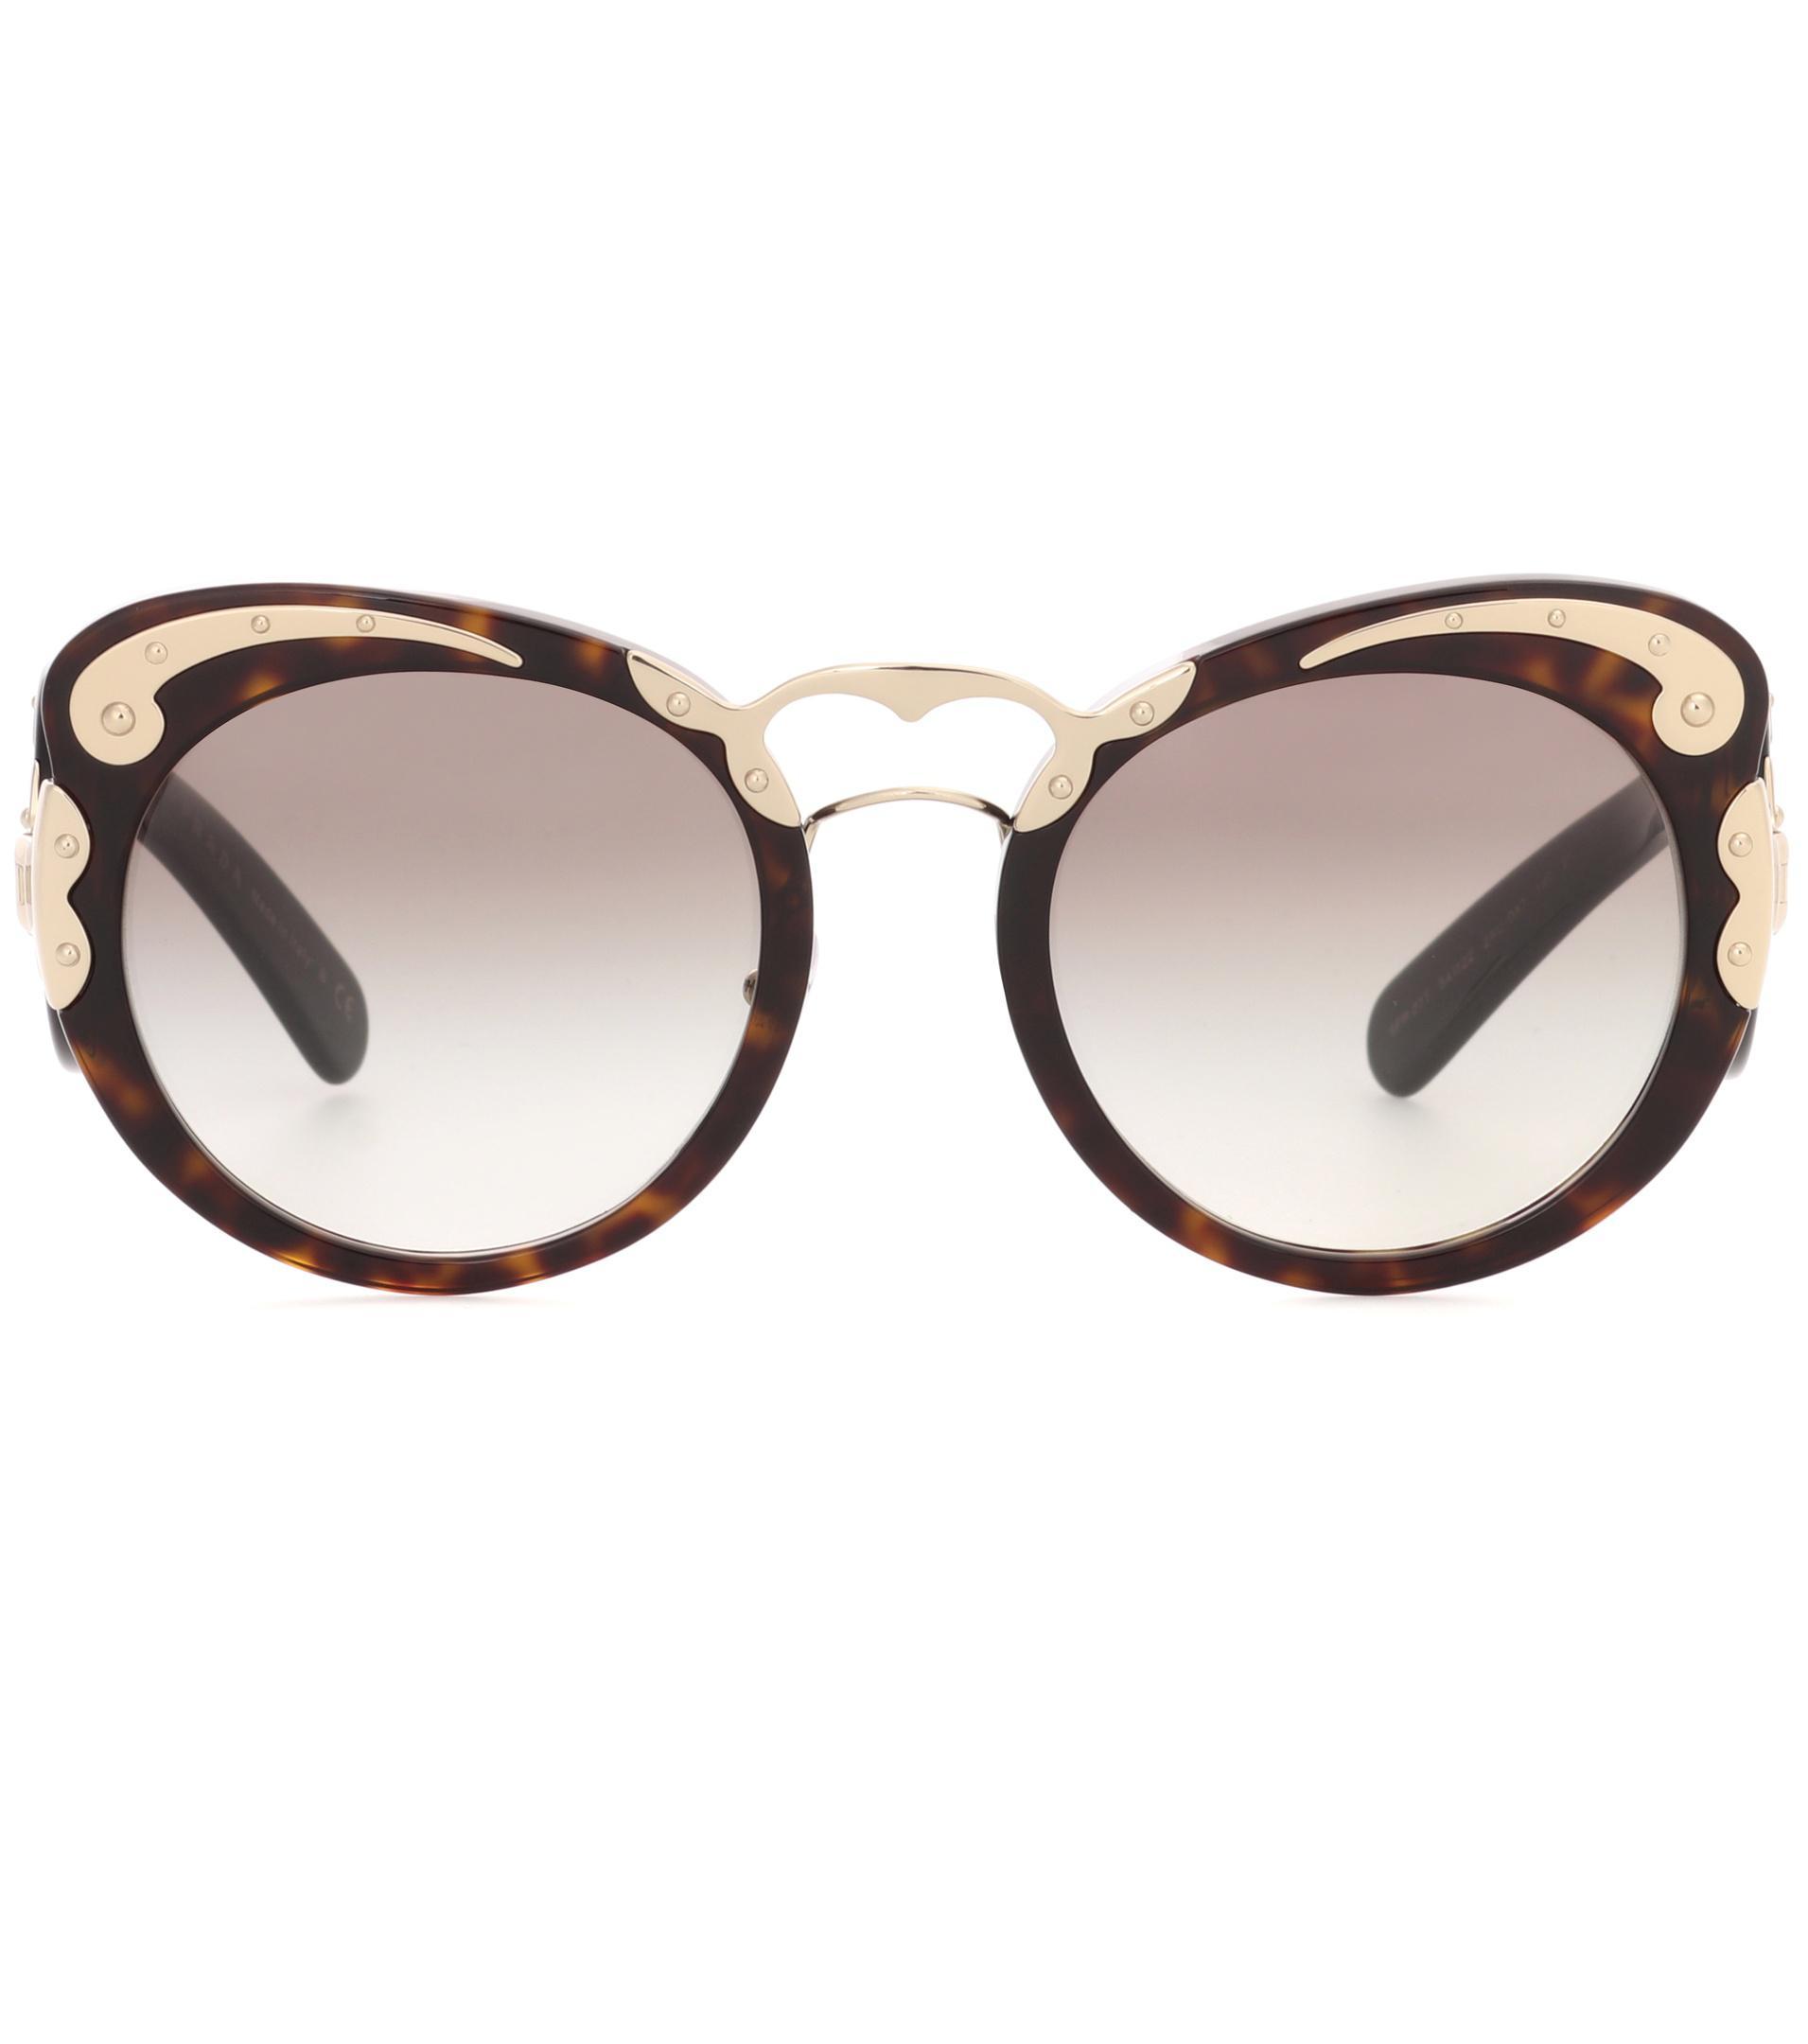 fb2ee571b46 Lyst - Prada Minimal-baroque Sunglasses in Brown